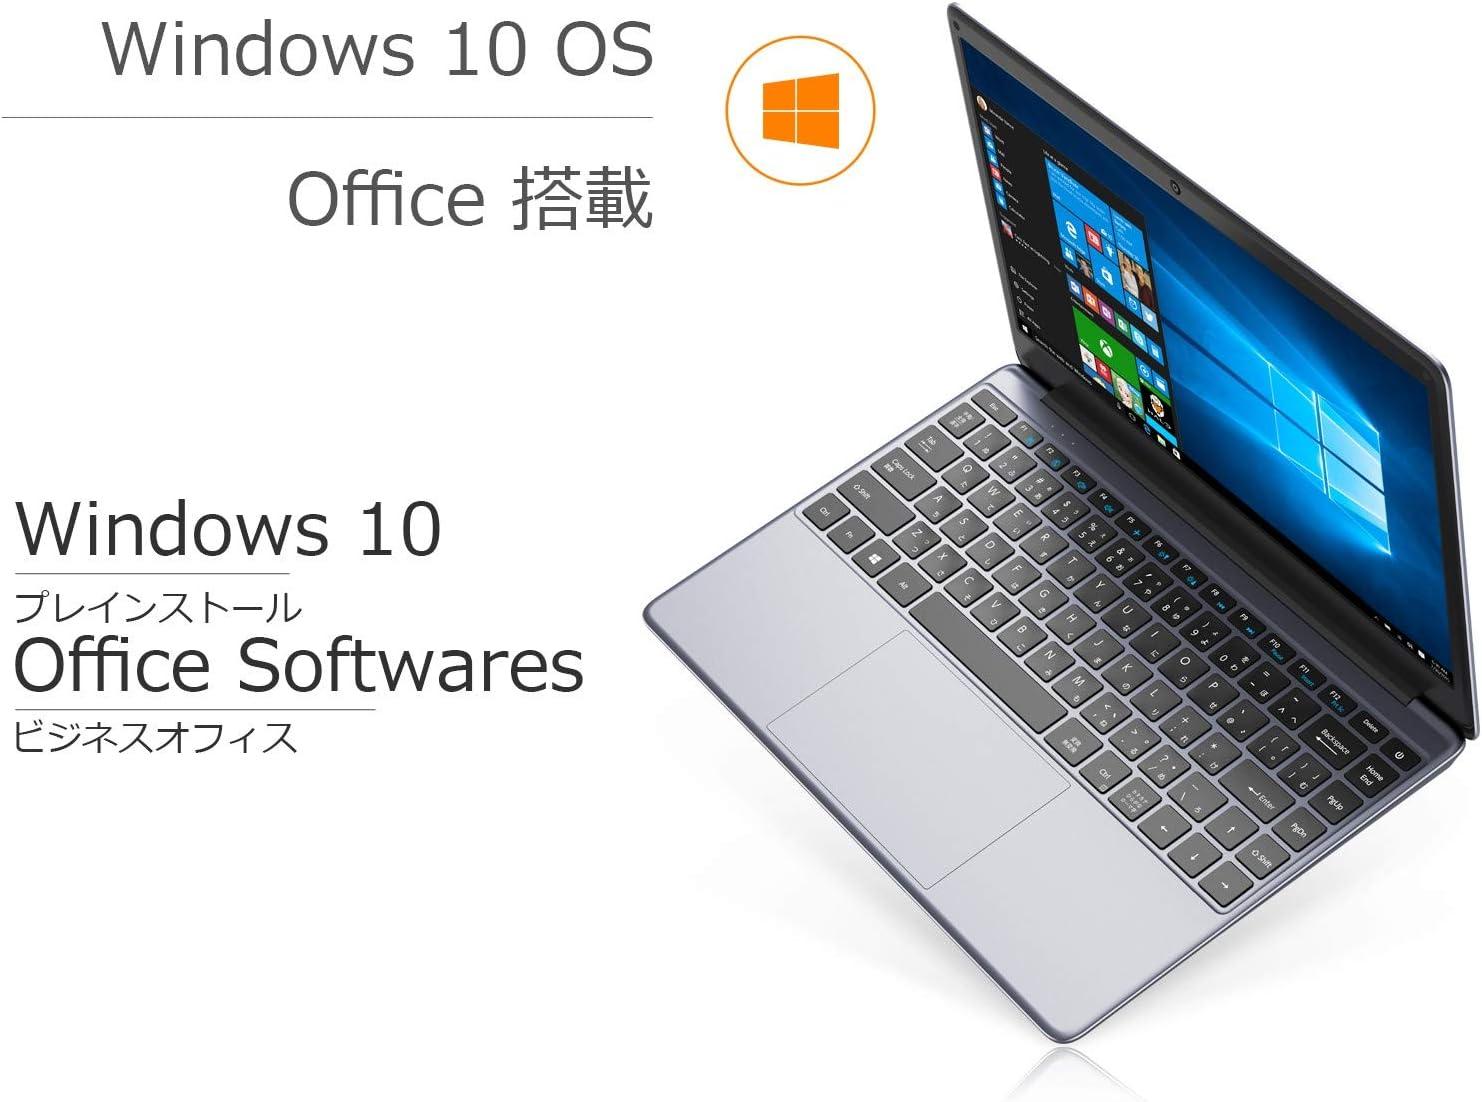 CHUWI Herobook proノートパソコン 14.1型Windows10 8GB メモリー+256GB SSD